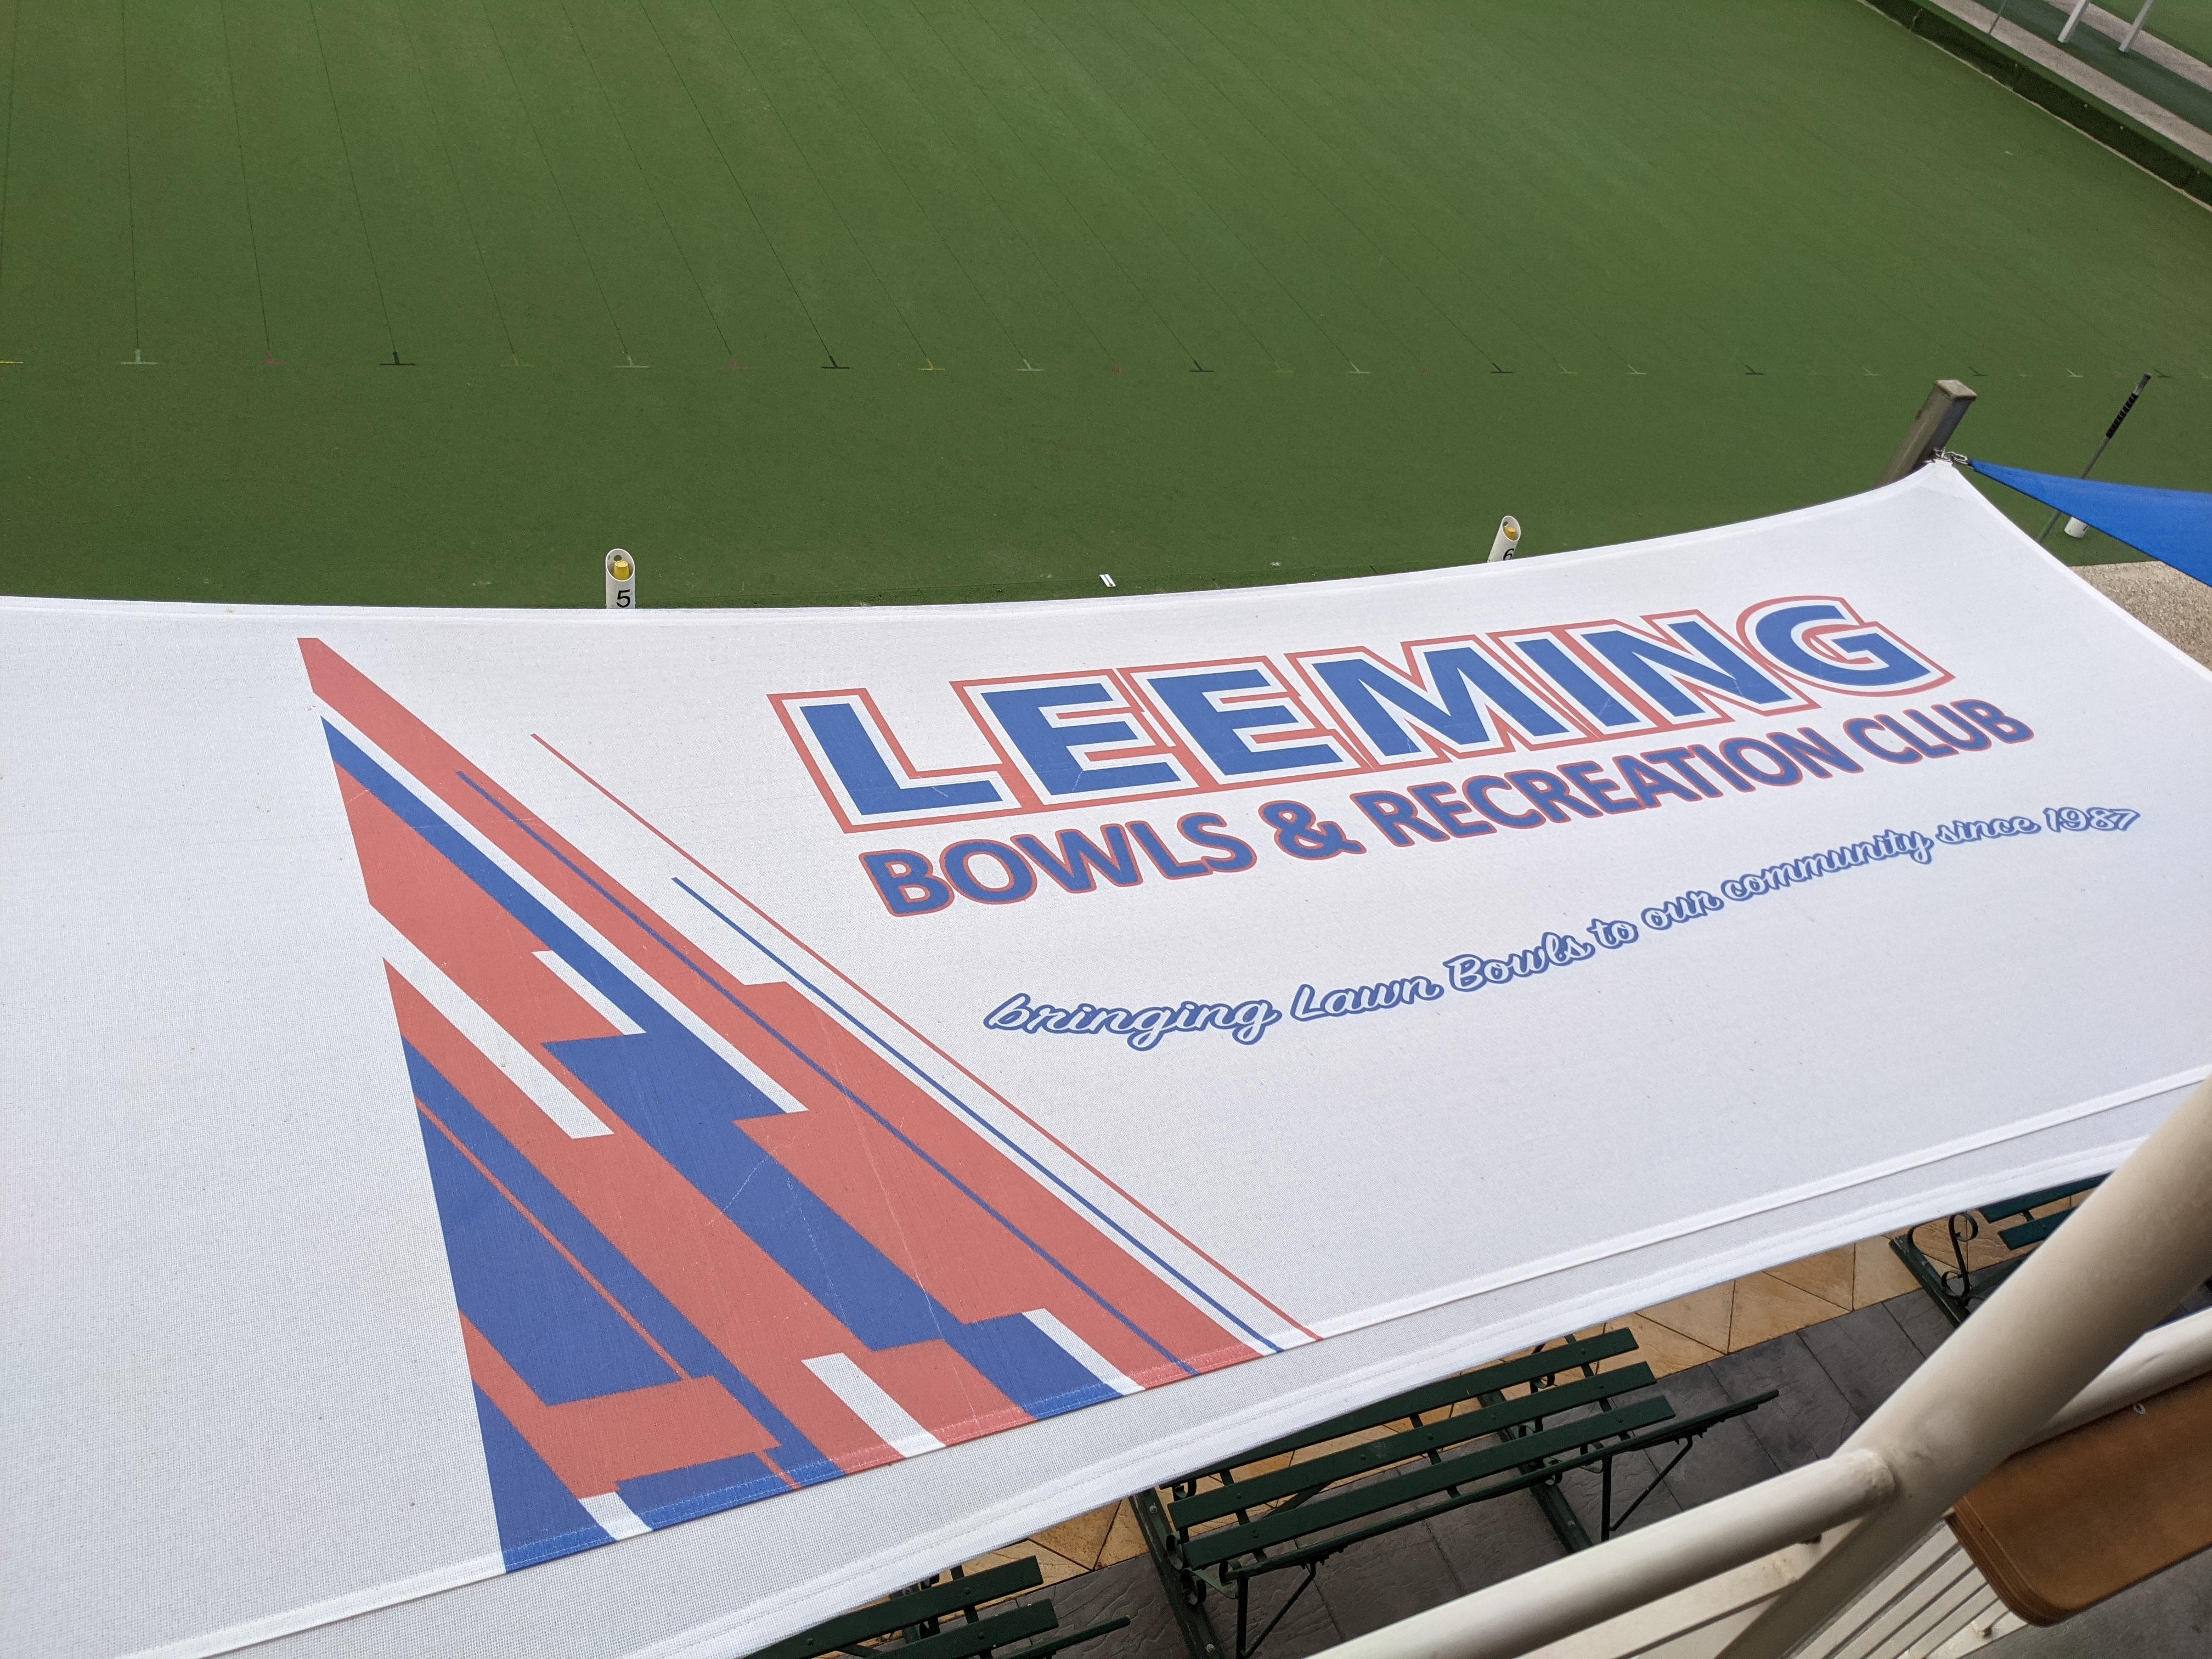 Sail_City_Shade_Sails_Leeming_Bowling_club_4.jpg